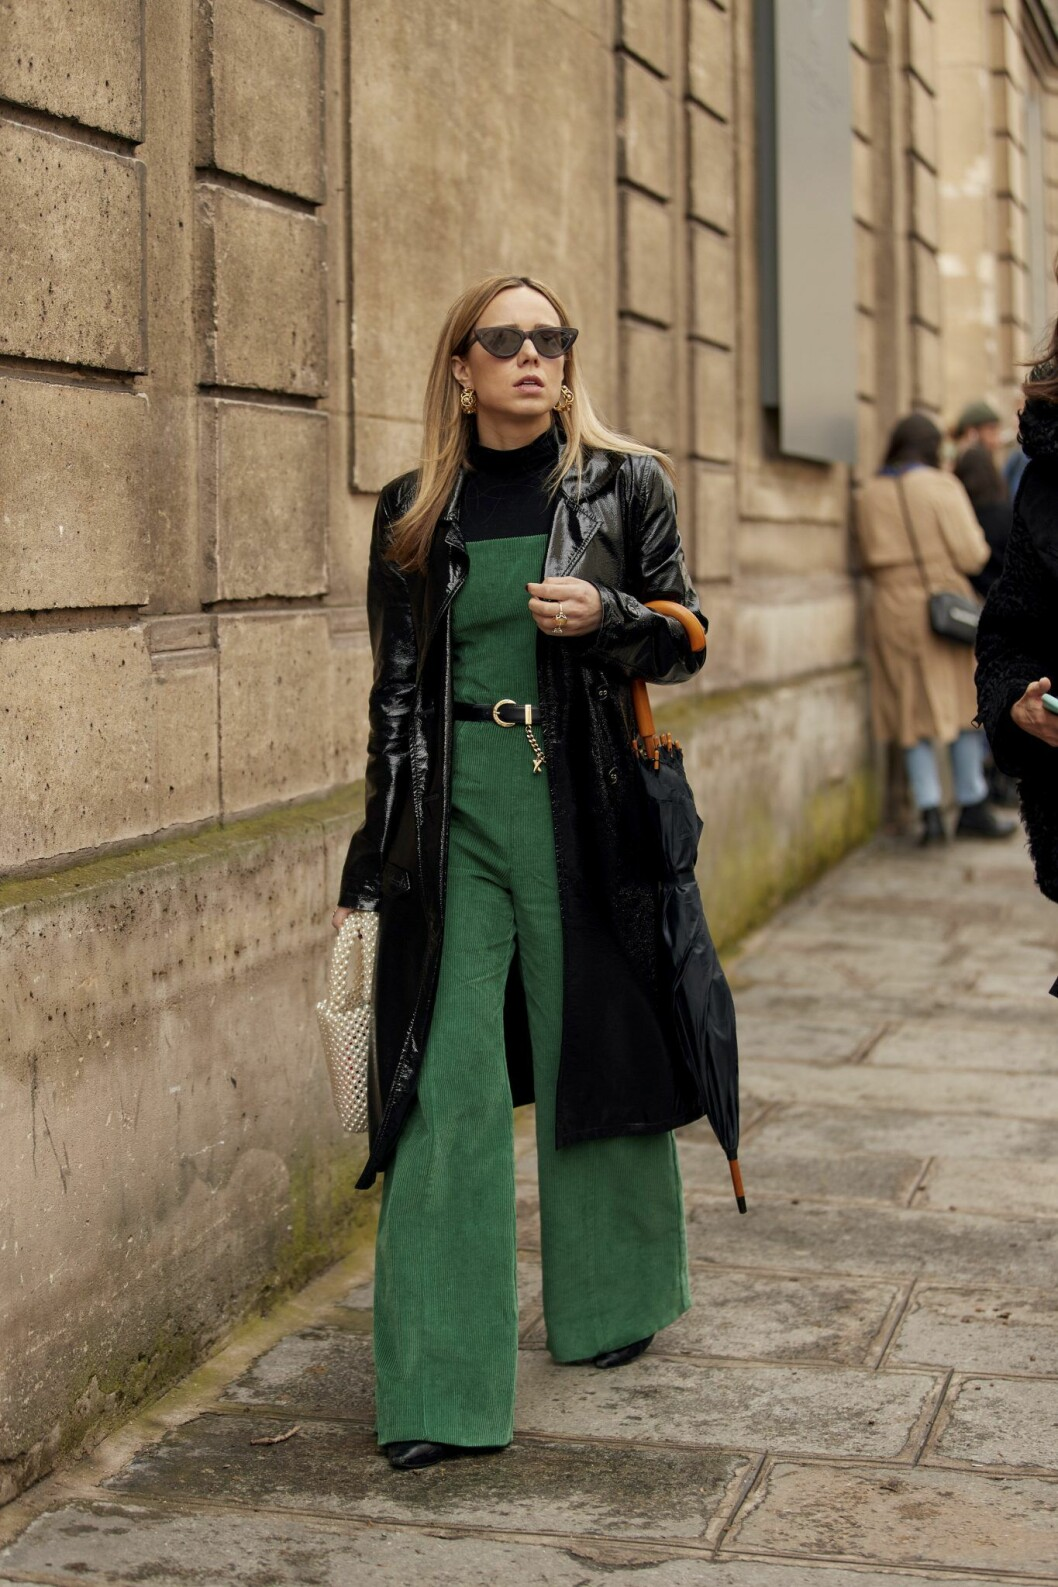 Svart kappa och grön jumpsuit Streetstyle Paris Fashion Week AW20.